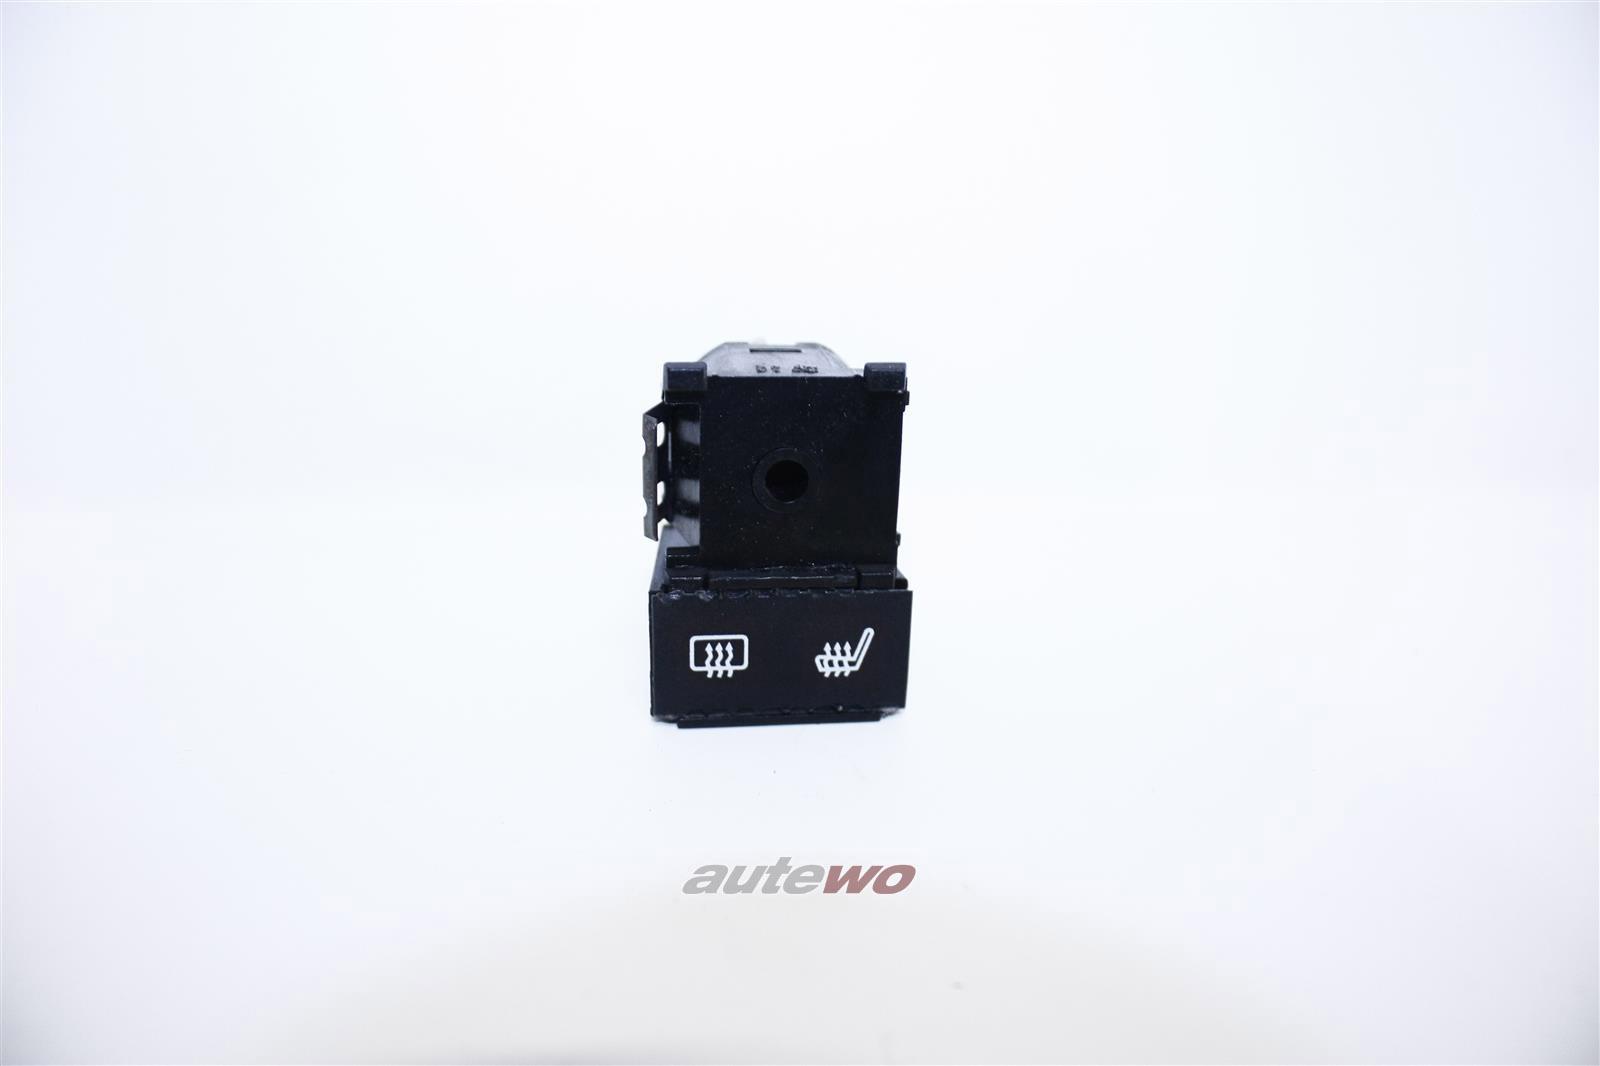 859959505 NEU Audi SportQuattro 2.2l Schalter für Gebläsemotor